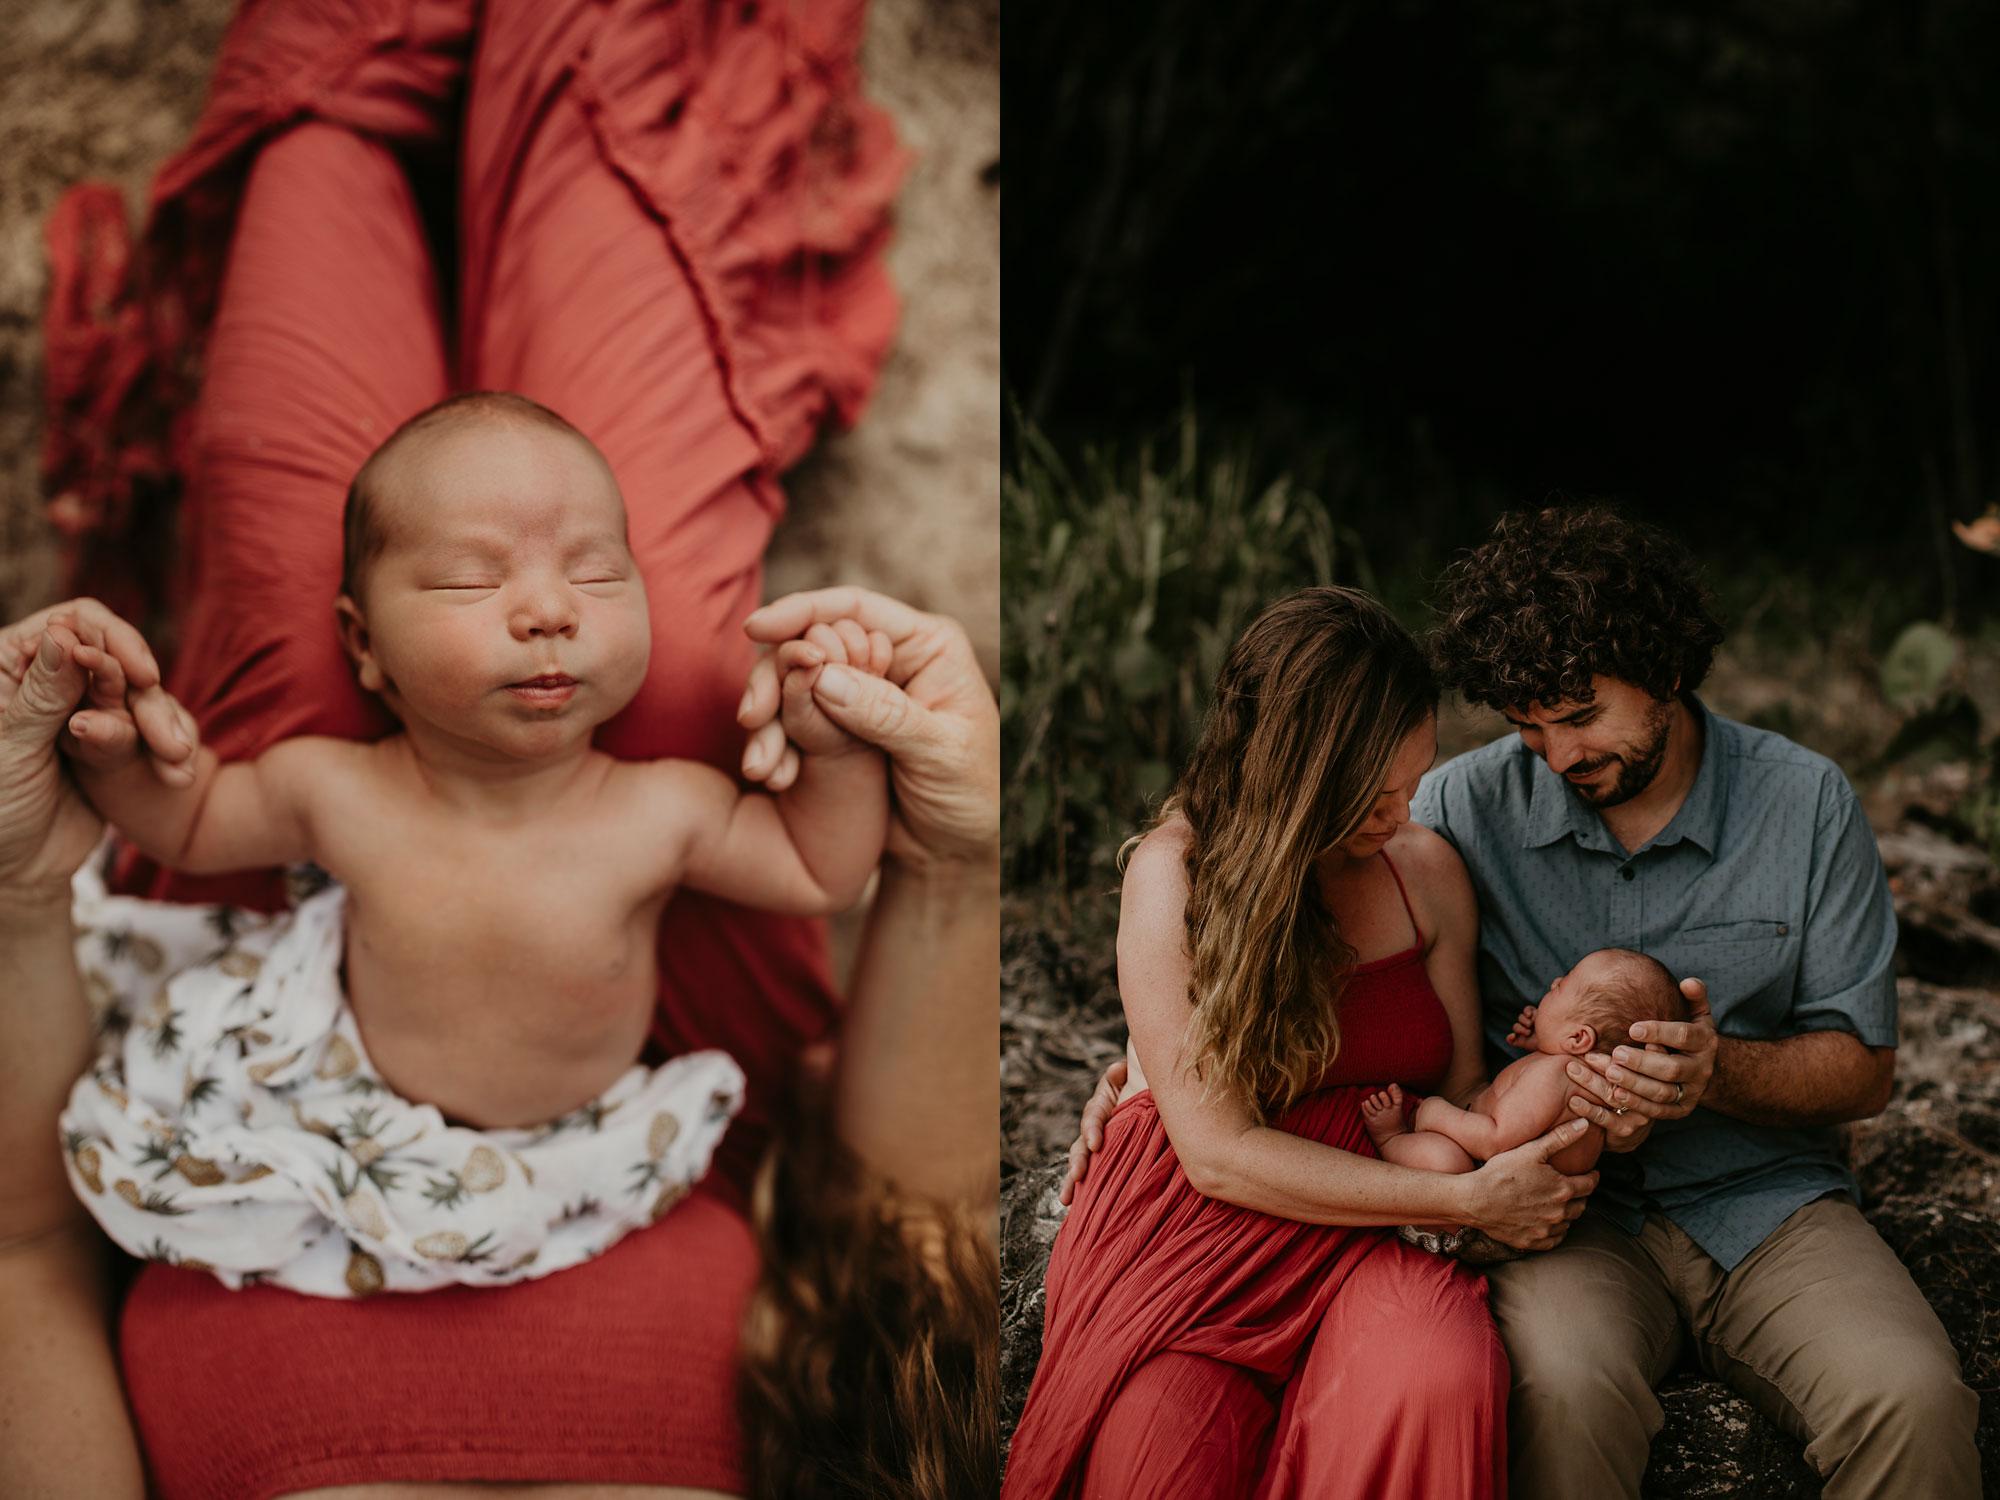 Hawaii-Outdoor-Newborn-Photography-08.jpg